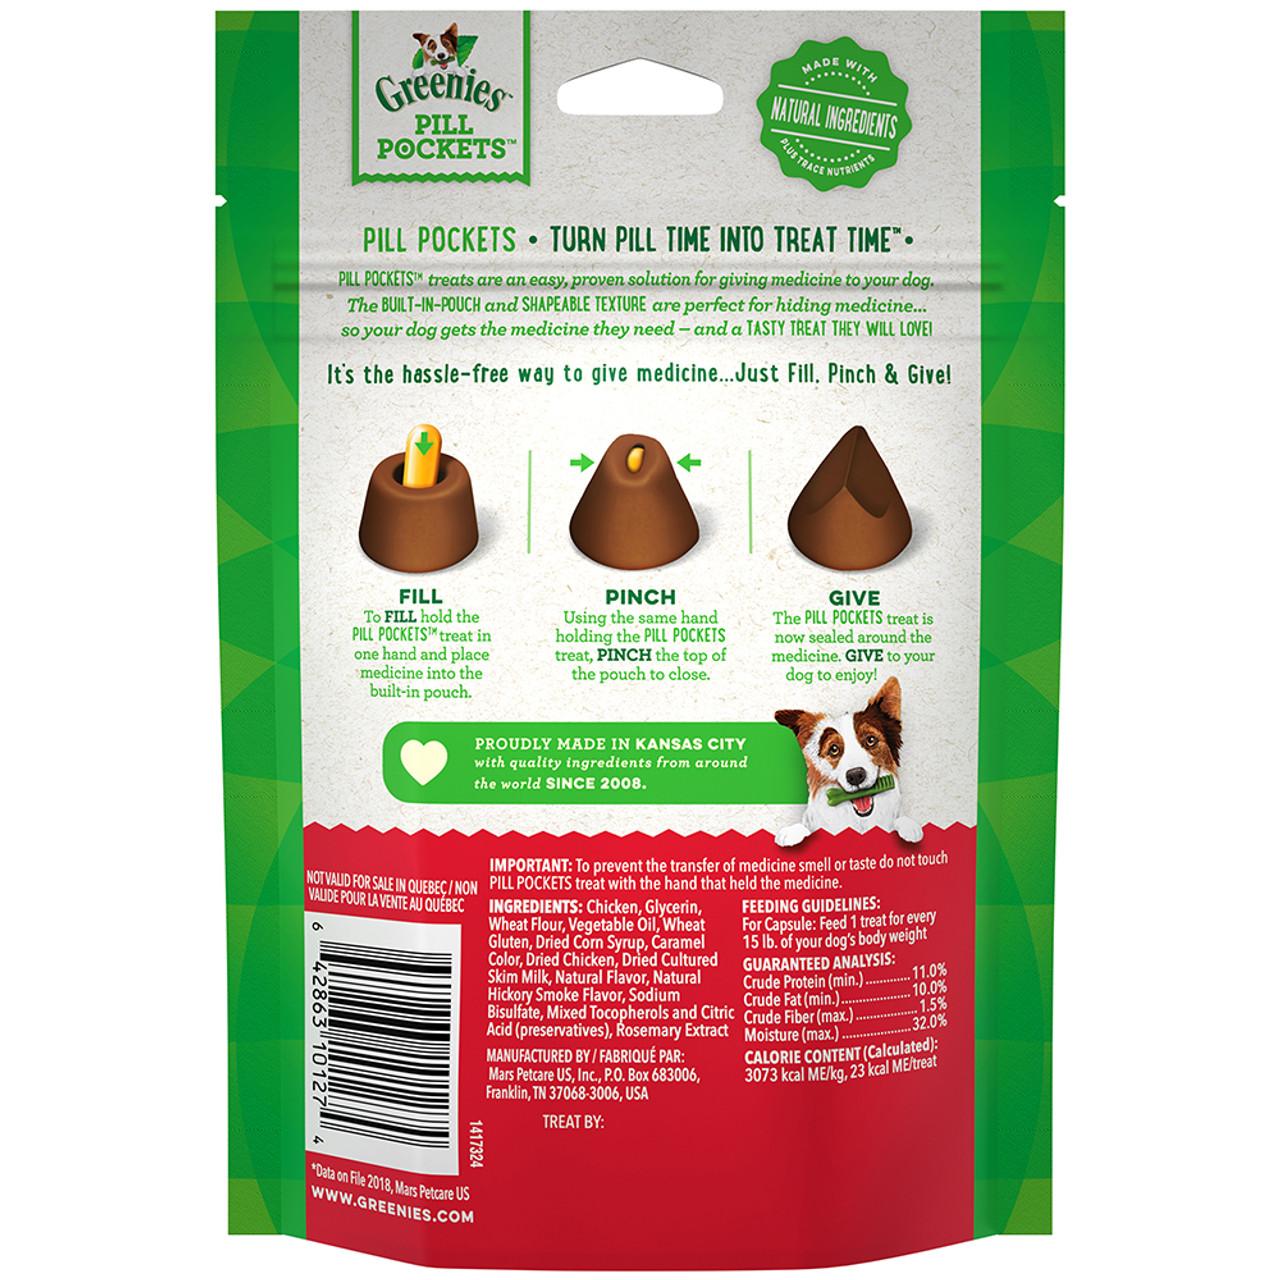 Greenies Original Pill Pockets Hickory Smoke Flavor Dog Treats